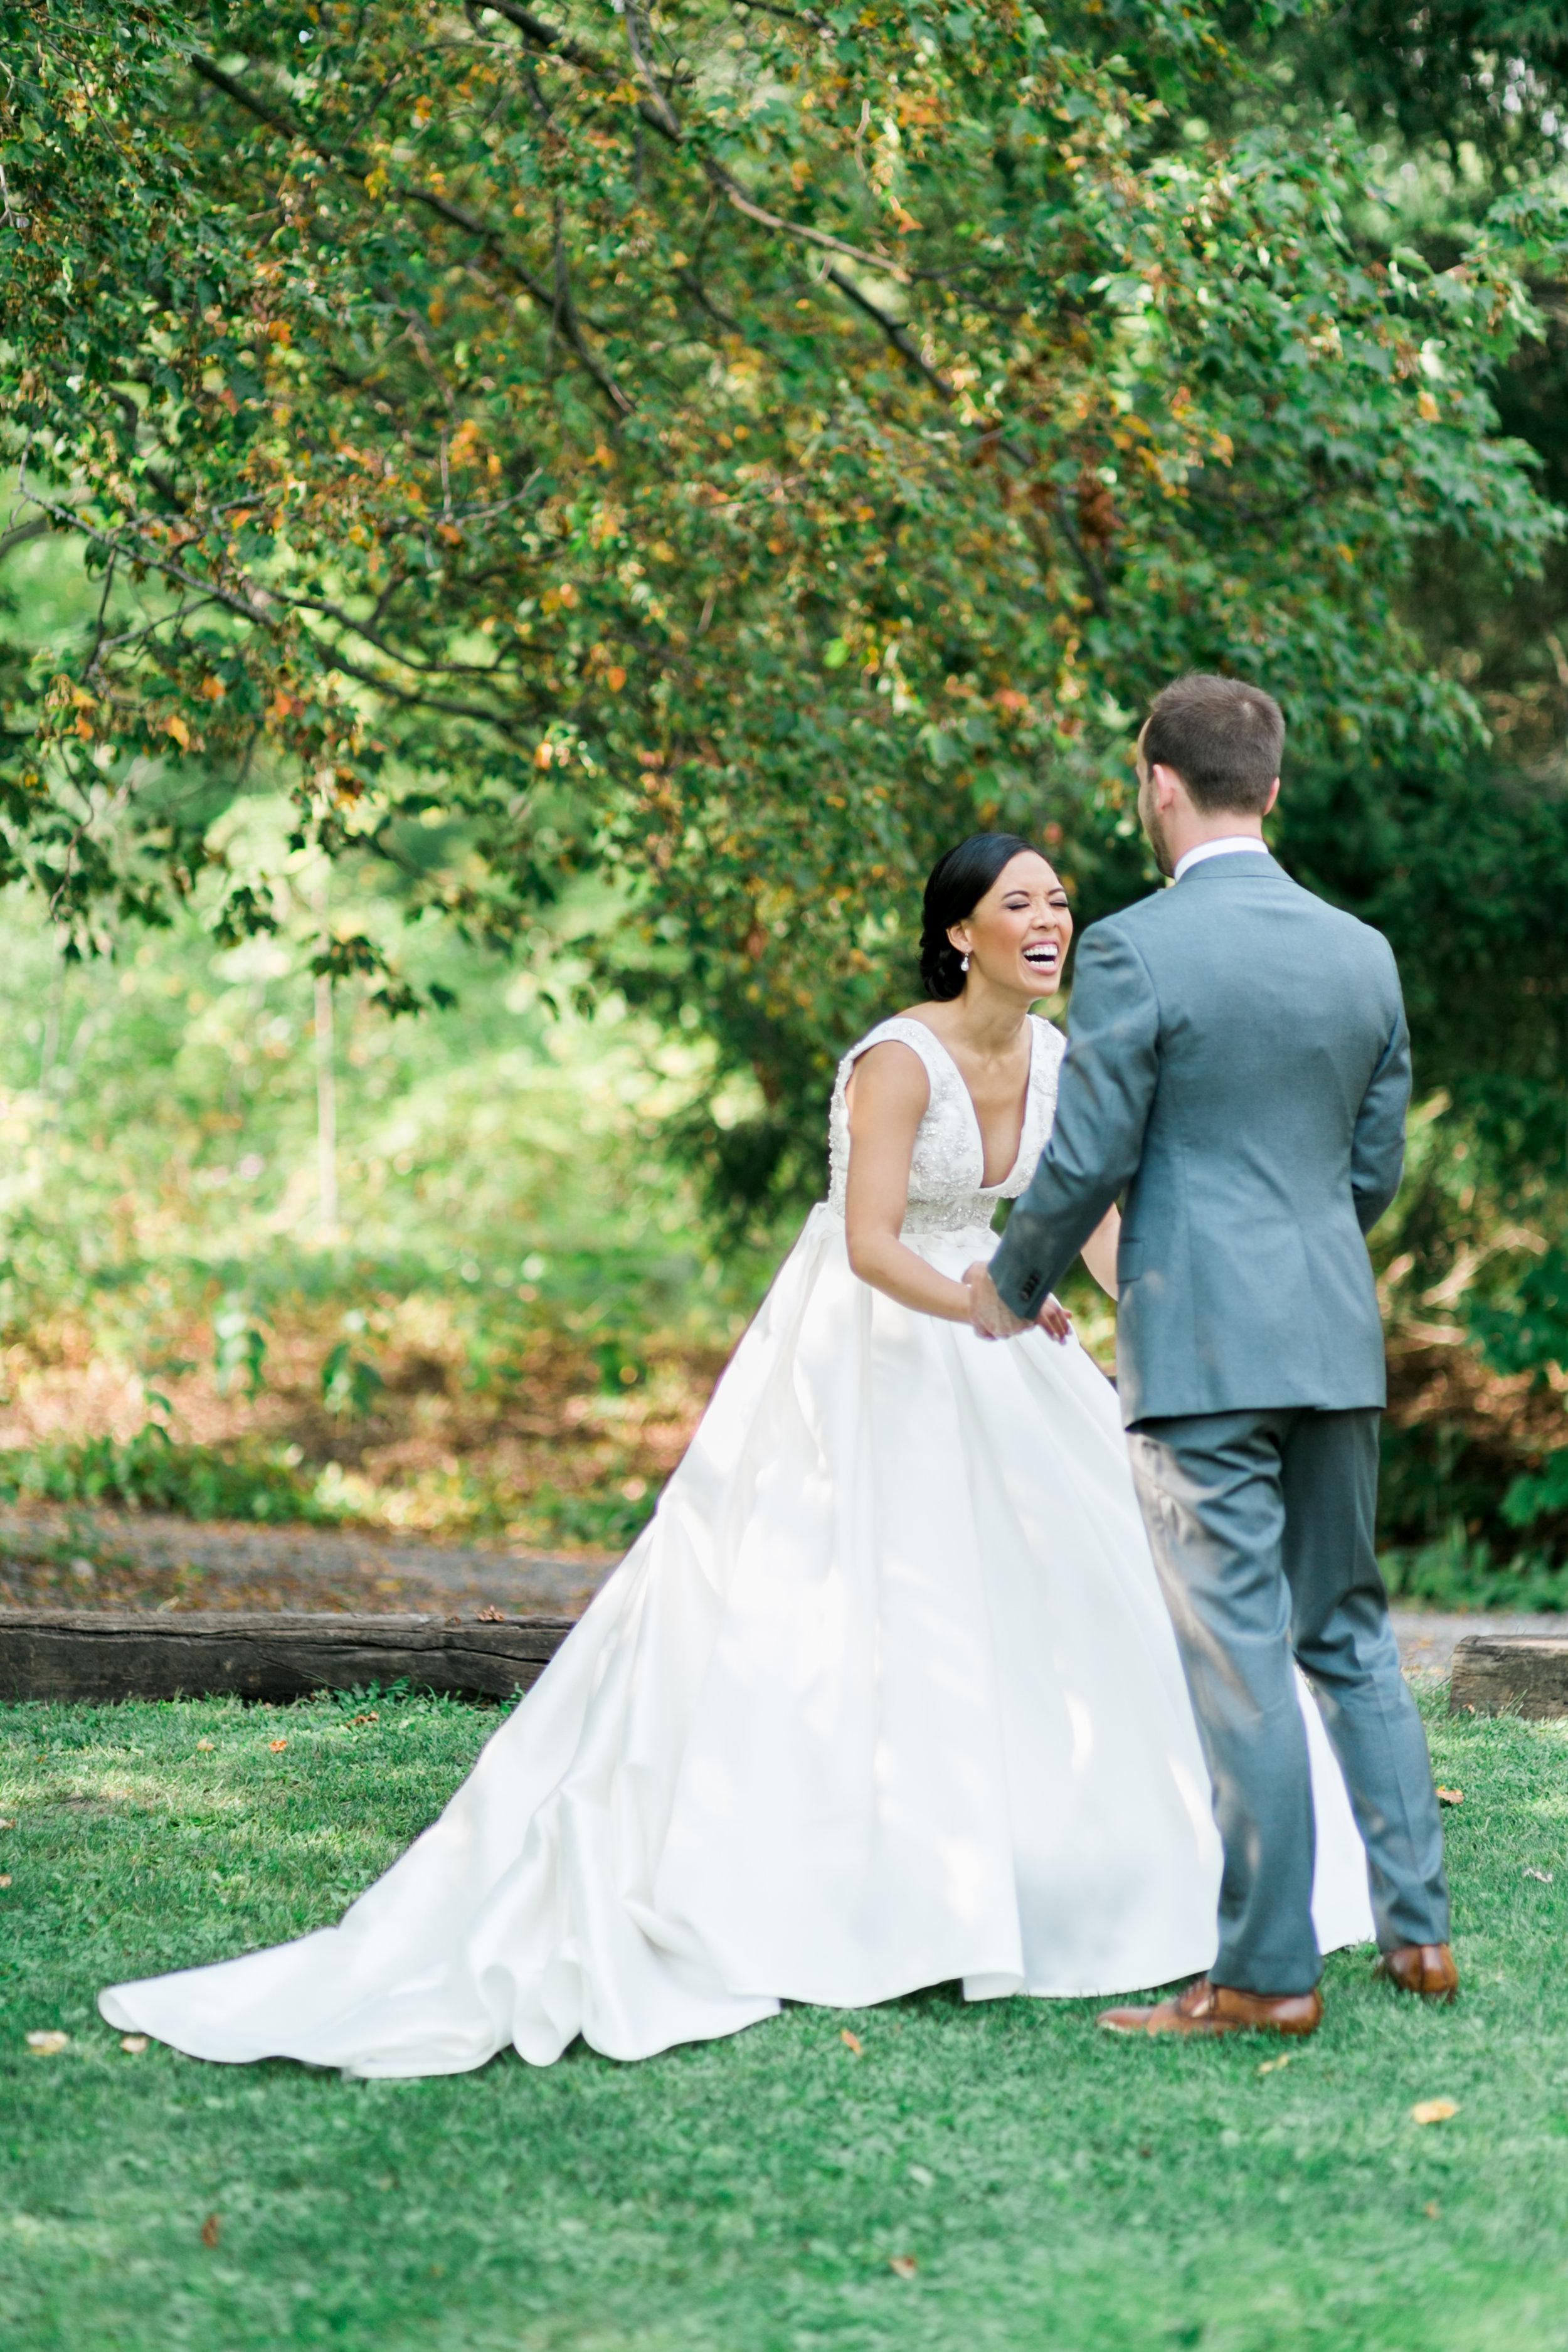 Alton Mills Wedding - First Look-12.jpg